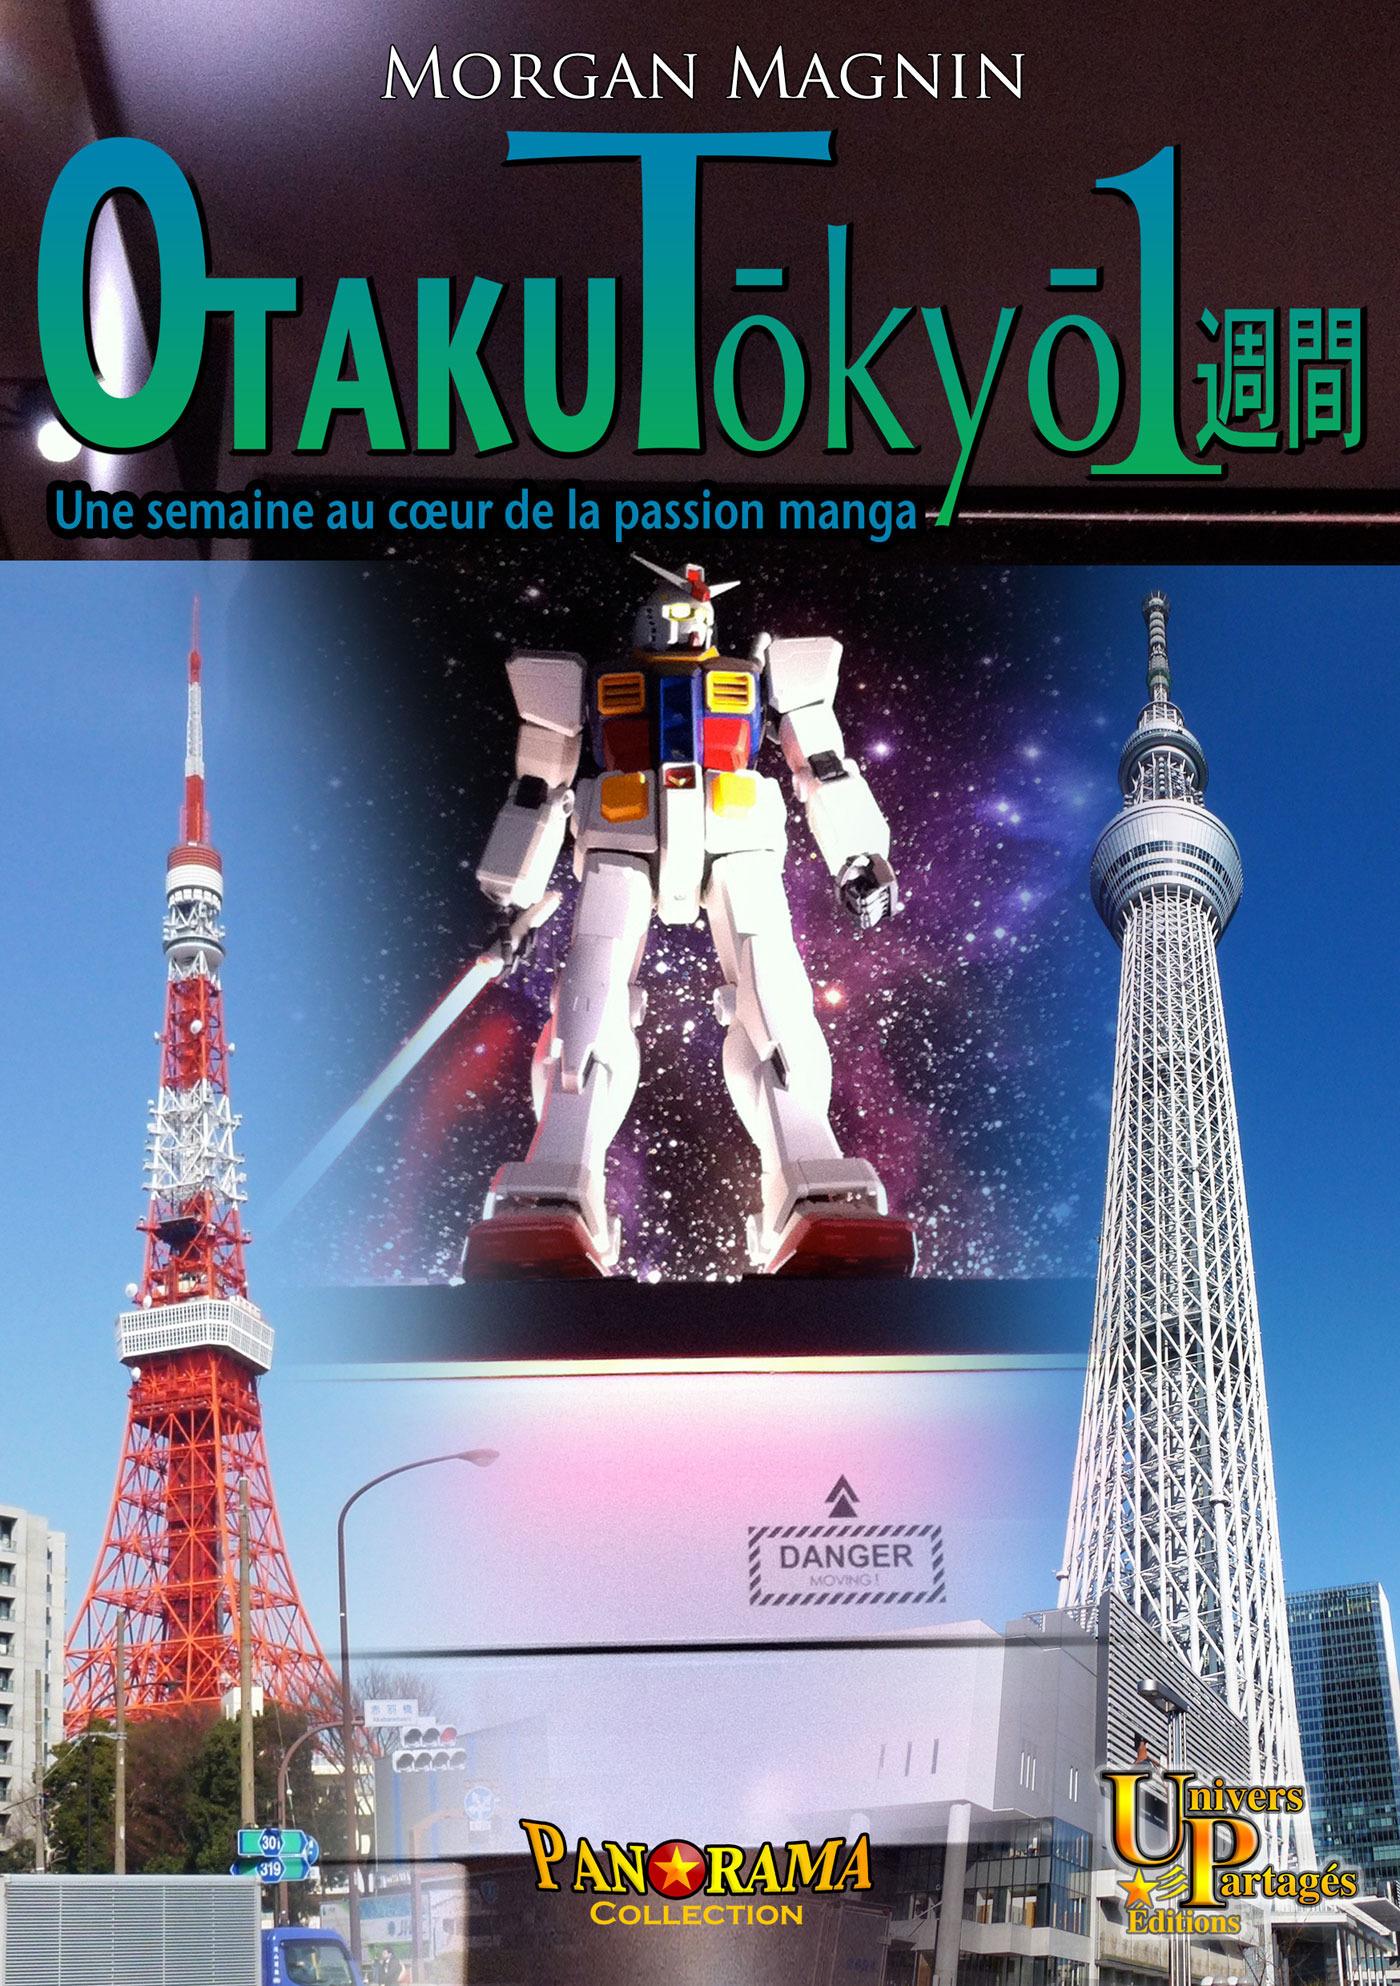 Otaku Tokyo isshukan